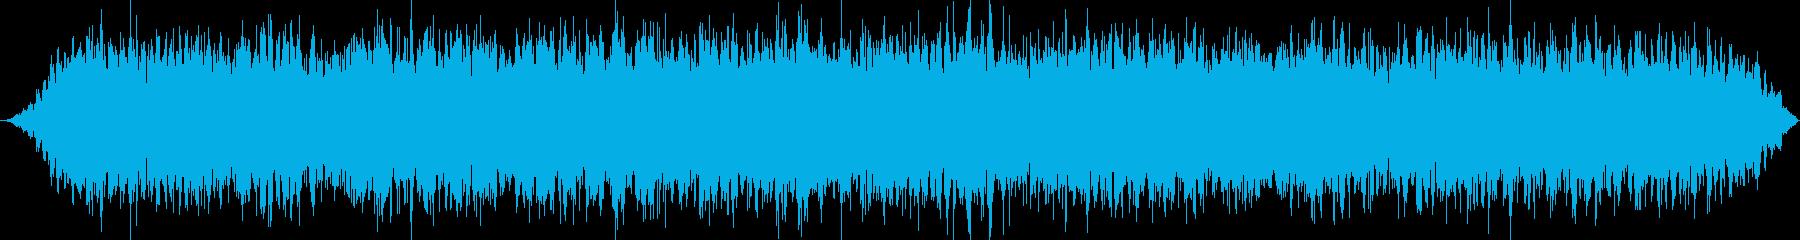 PADS 不安定な世界02の再生済みの波形